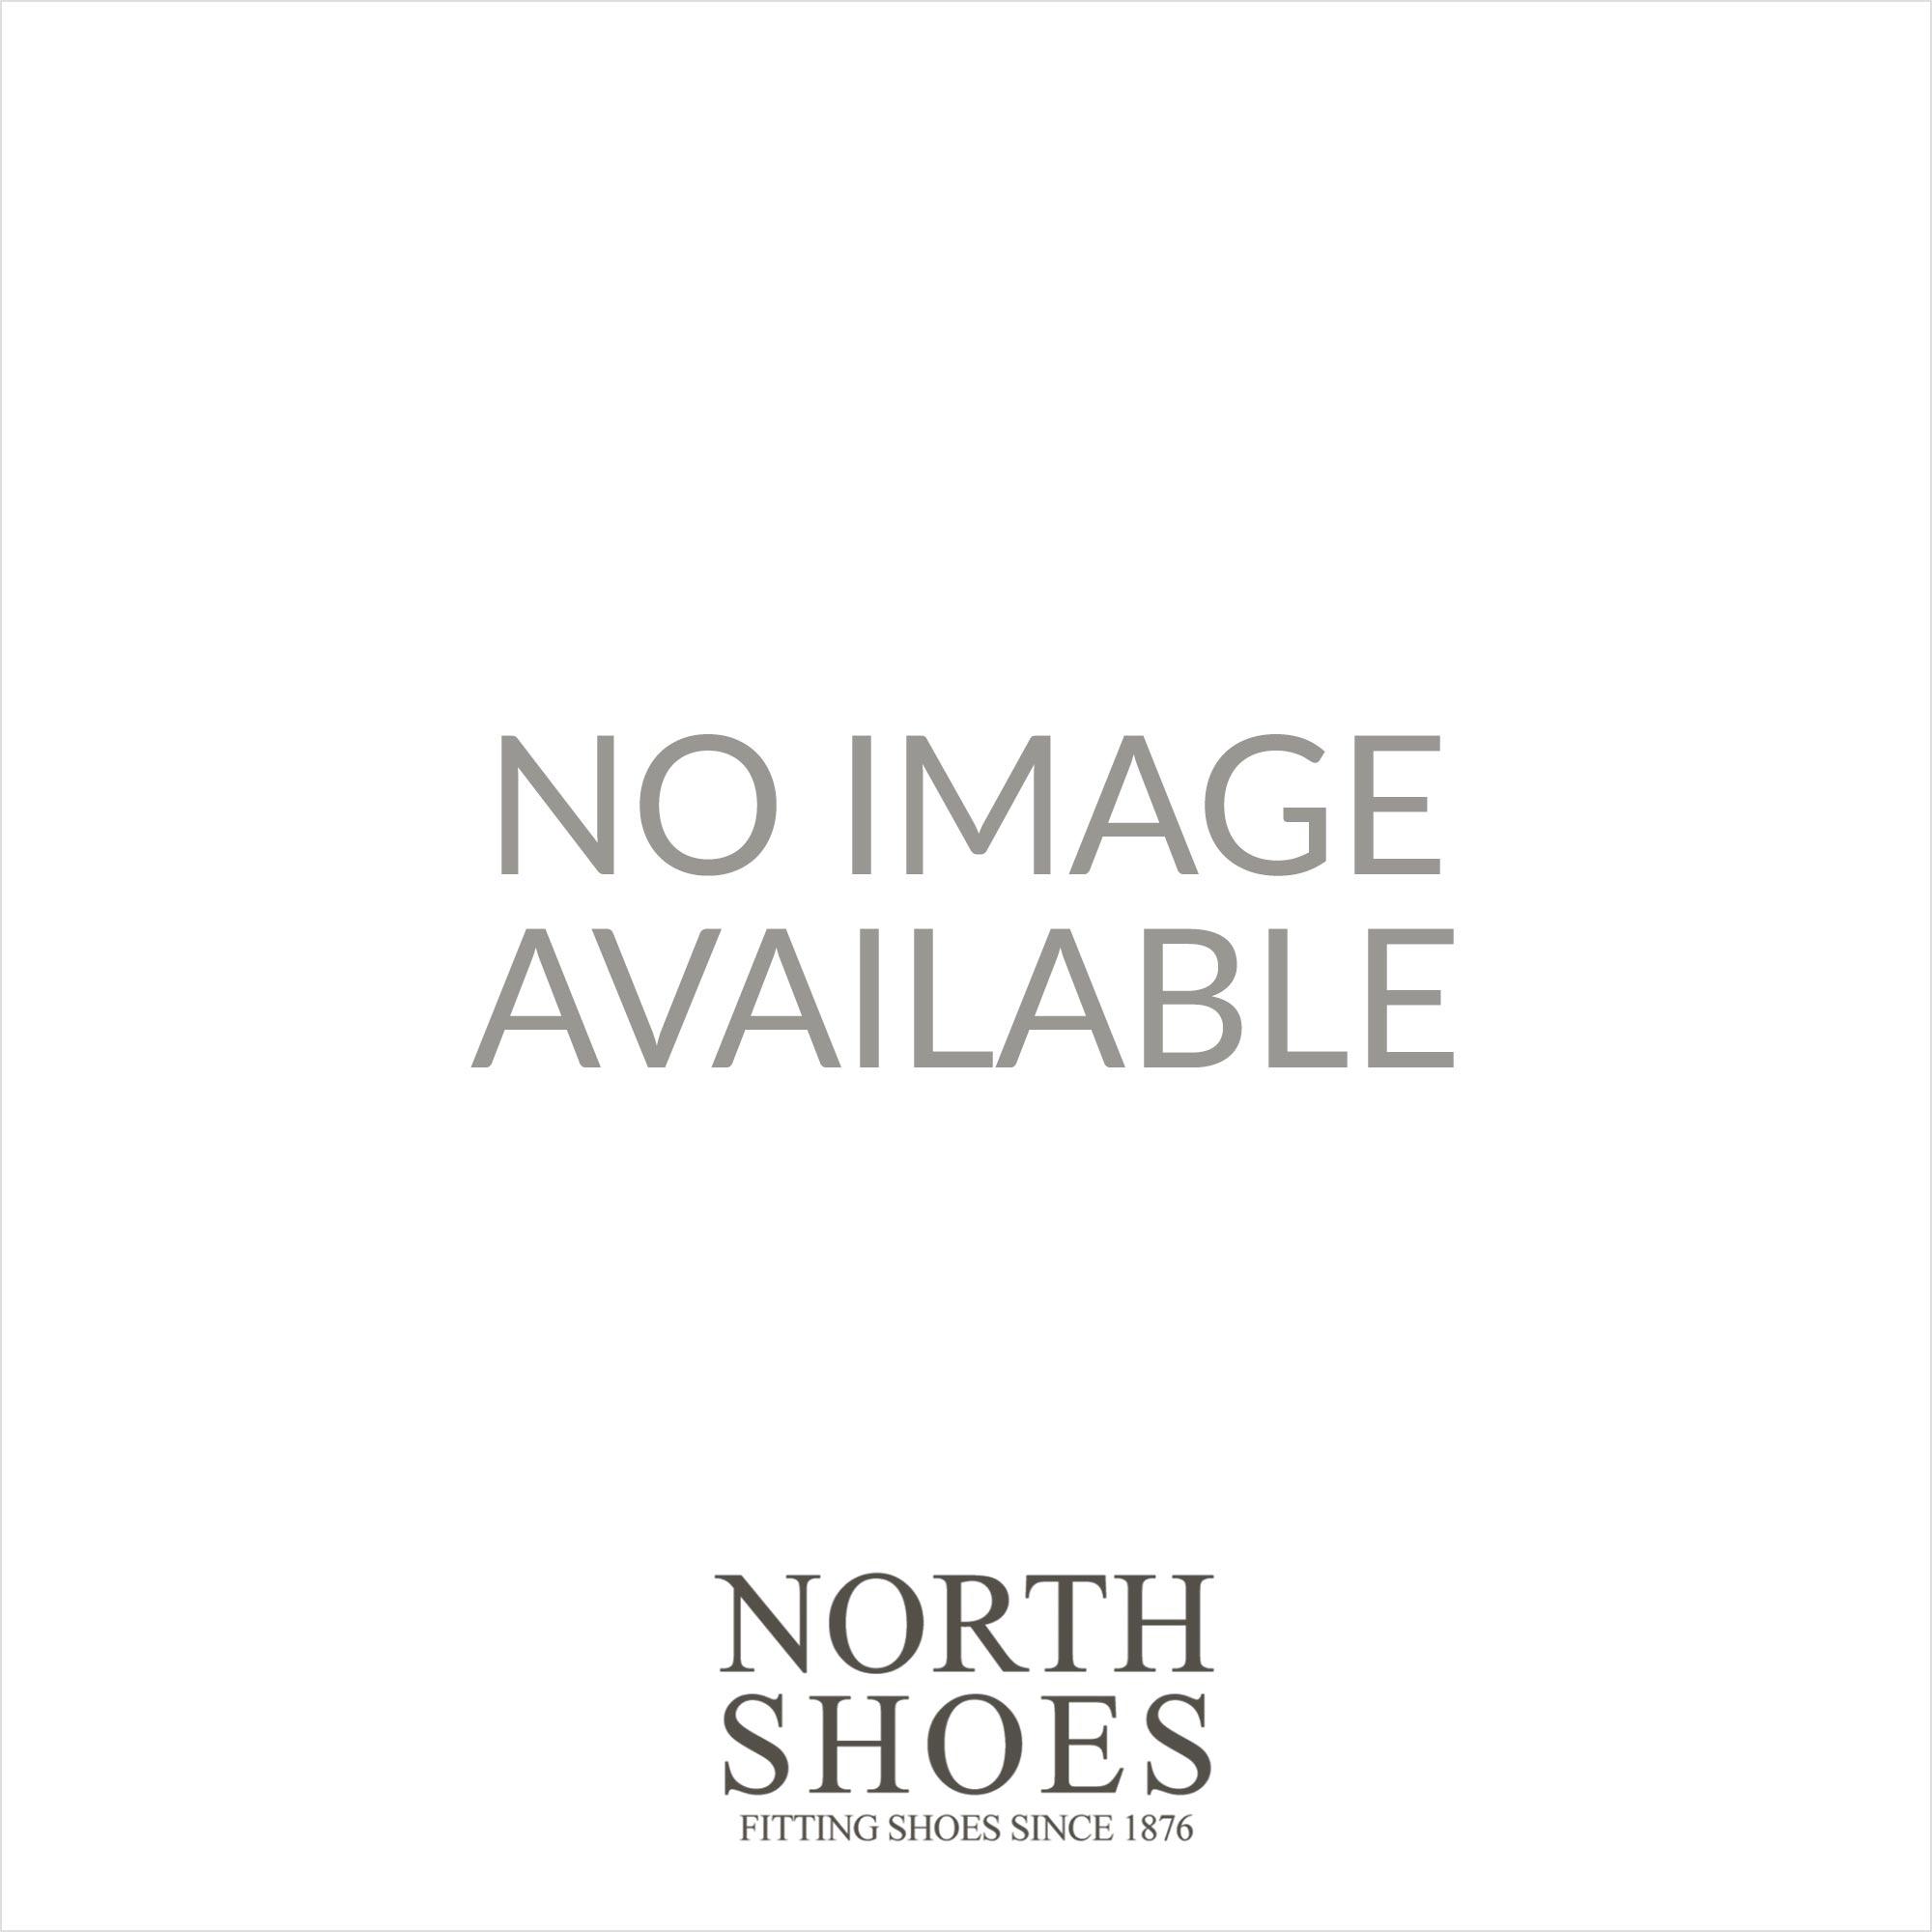 0e683c549ac0 Toni Pons Ter Raspberry Linen Womens Wedge Espadrille Sandal - Toni Pons  from North Shoes UK